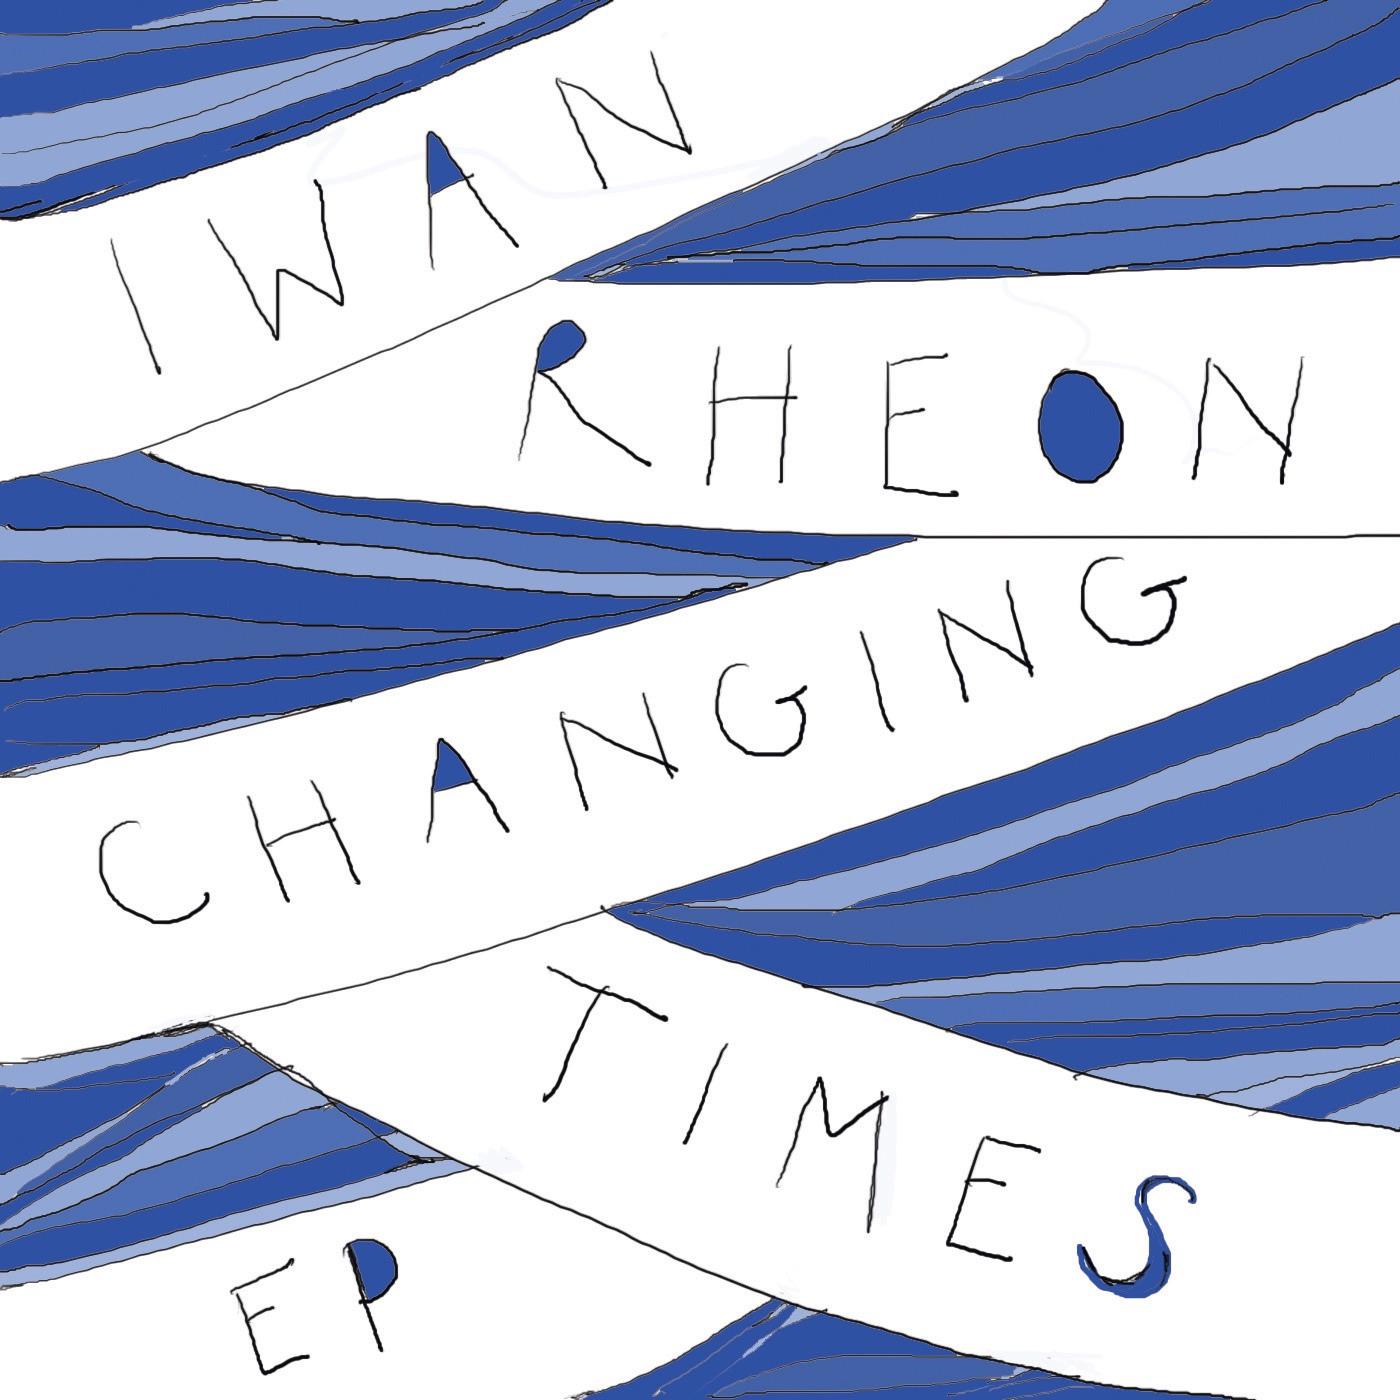 Iwan Rheon album Changing Times